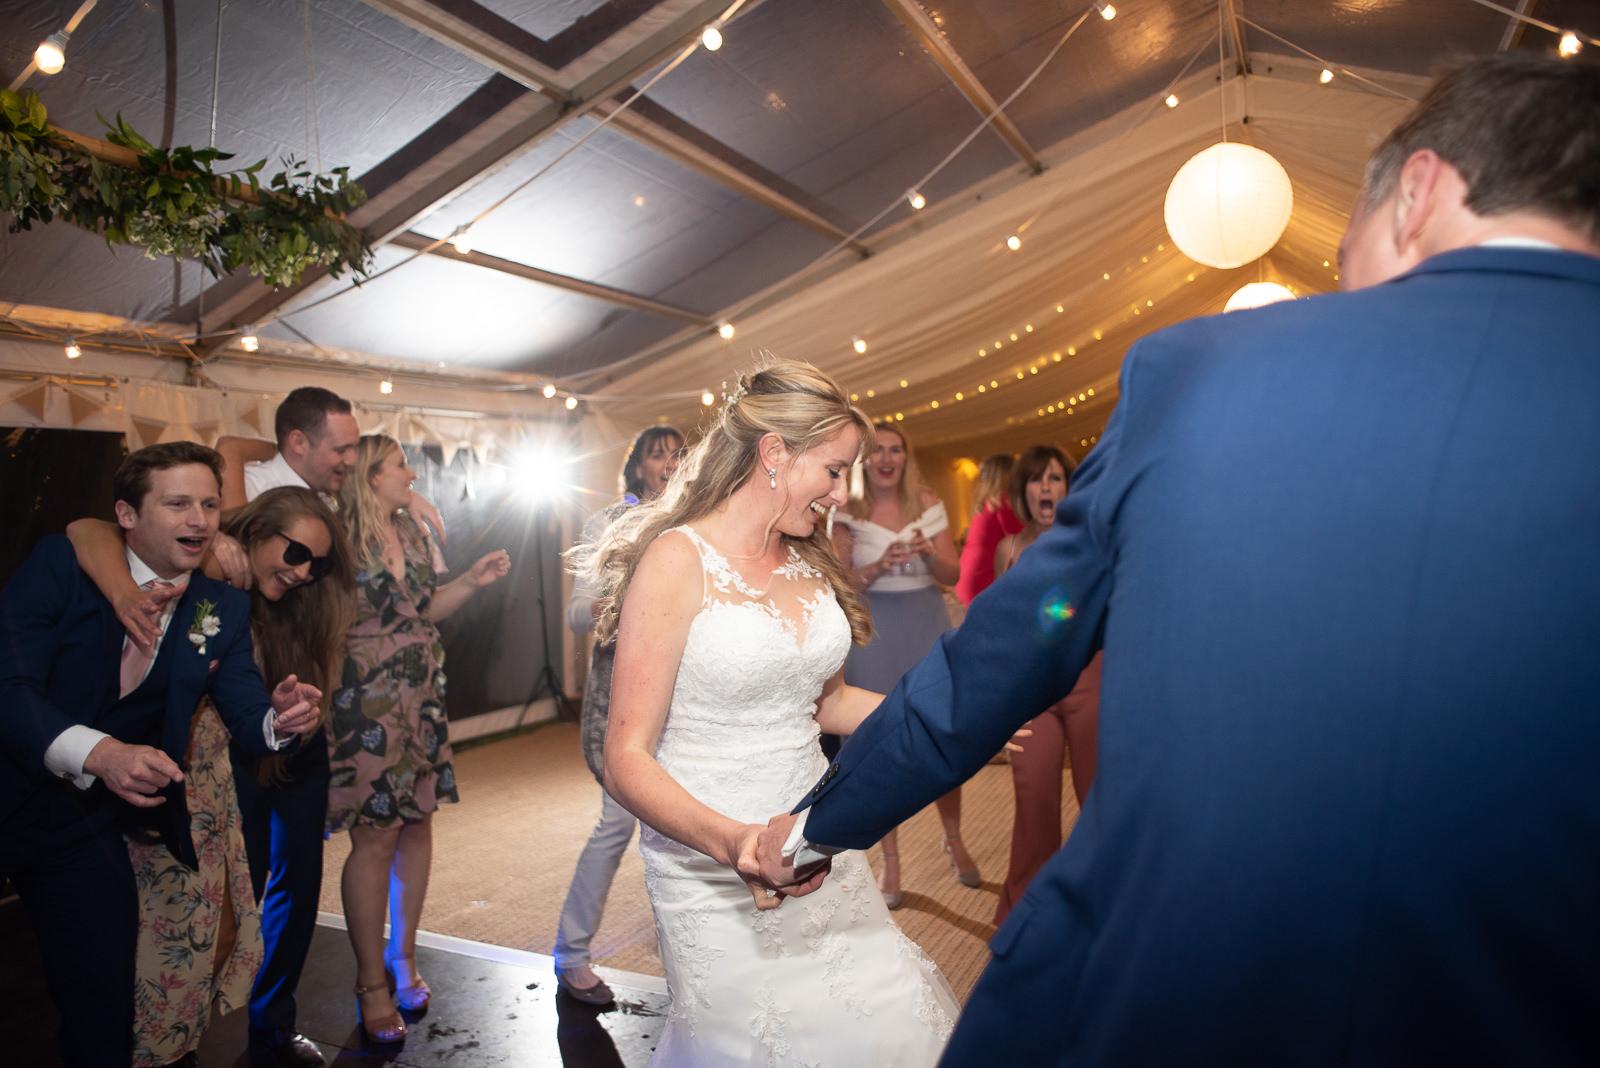 Roscarrock Farm wedding in Cornwall 086.jpg